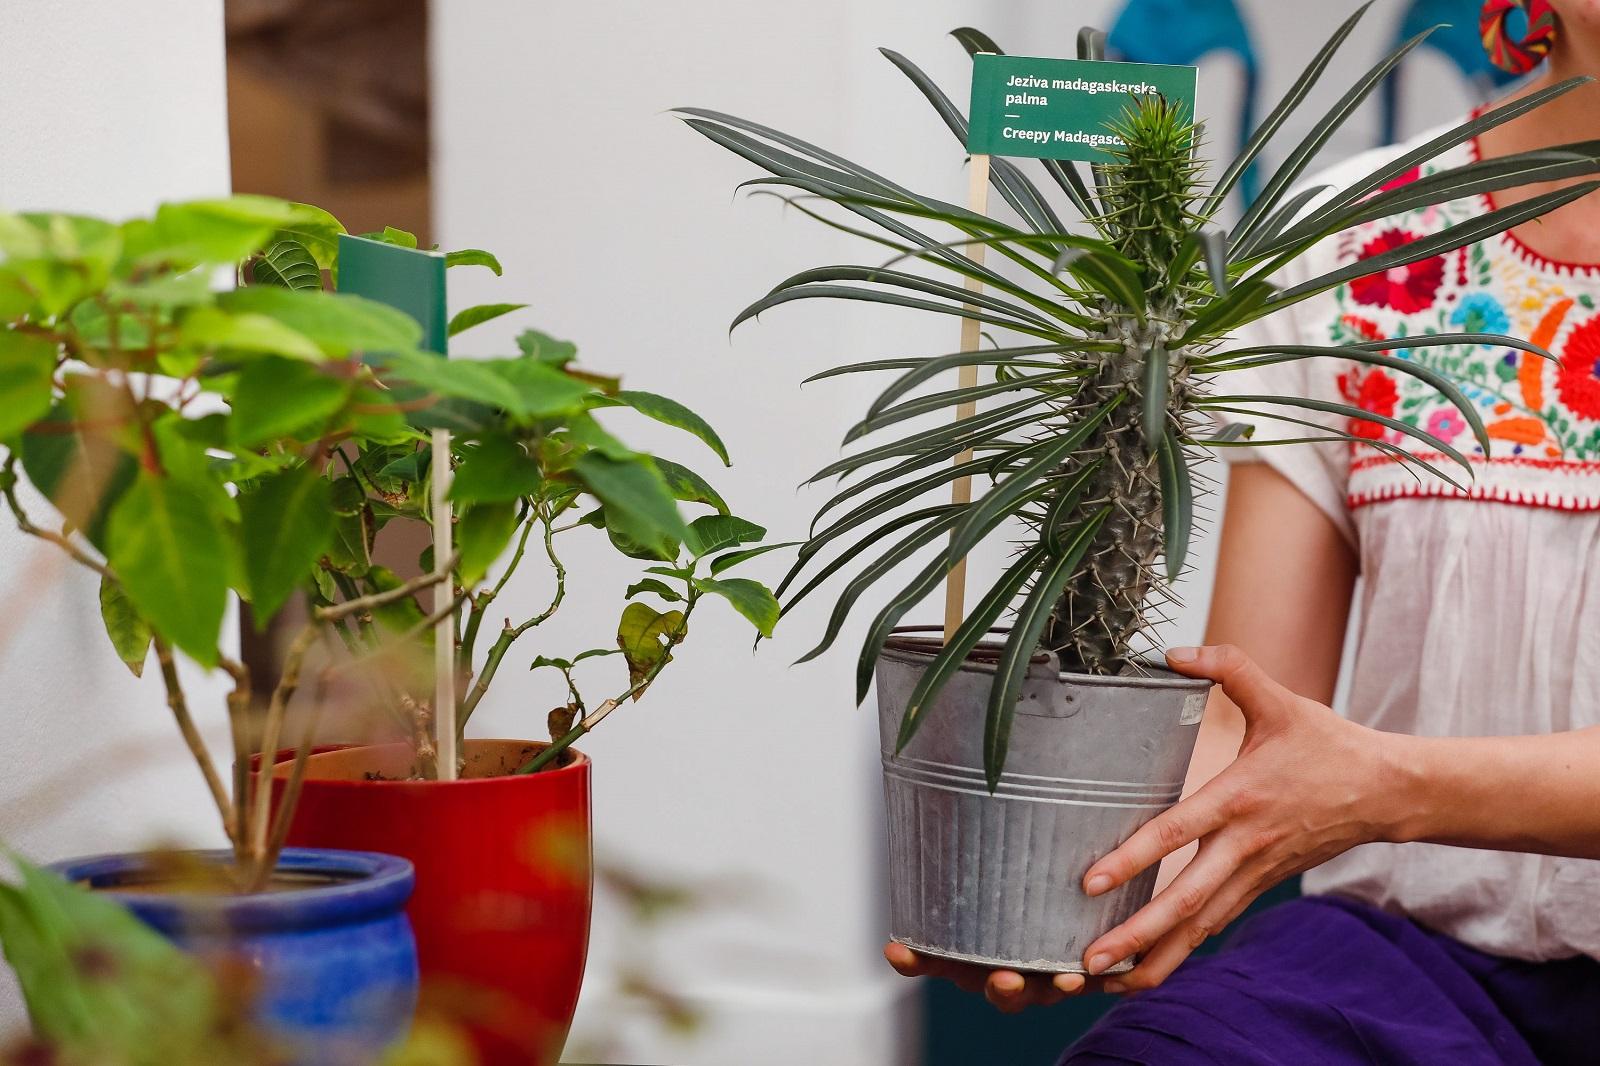 Zagreb, 290720. Cirilometodska ulica. Hotel za biljke otvoren je u sklopu Muzeja prekinutih veza.  Na fotografiji: biljke.  Foto: Marko Todorov / CROPIX